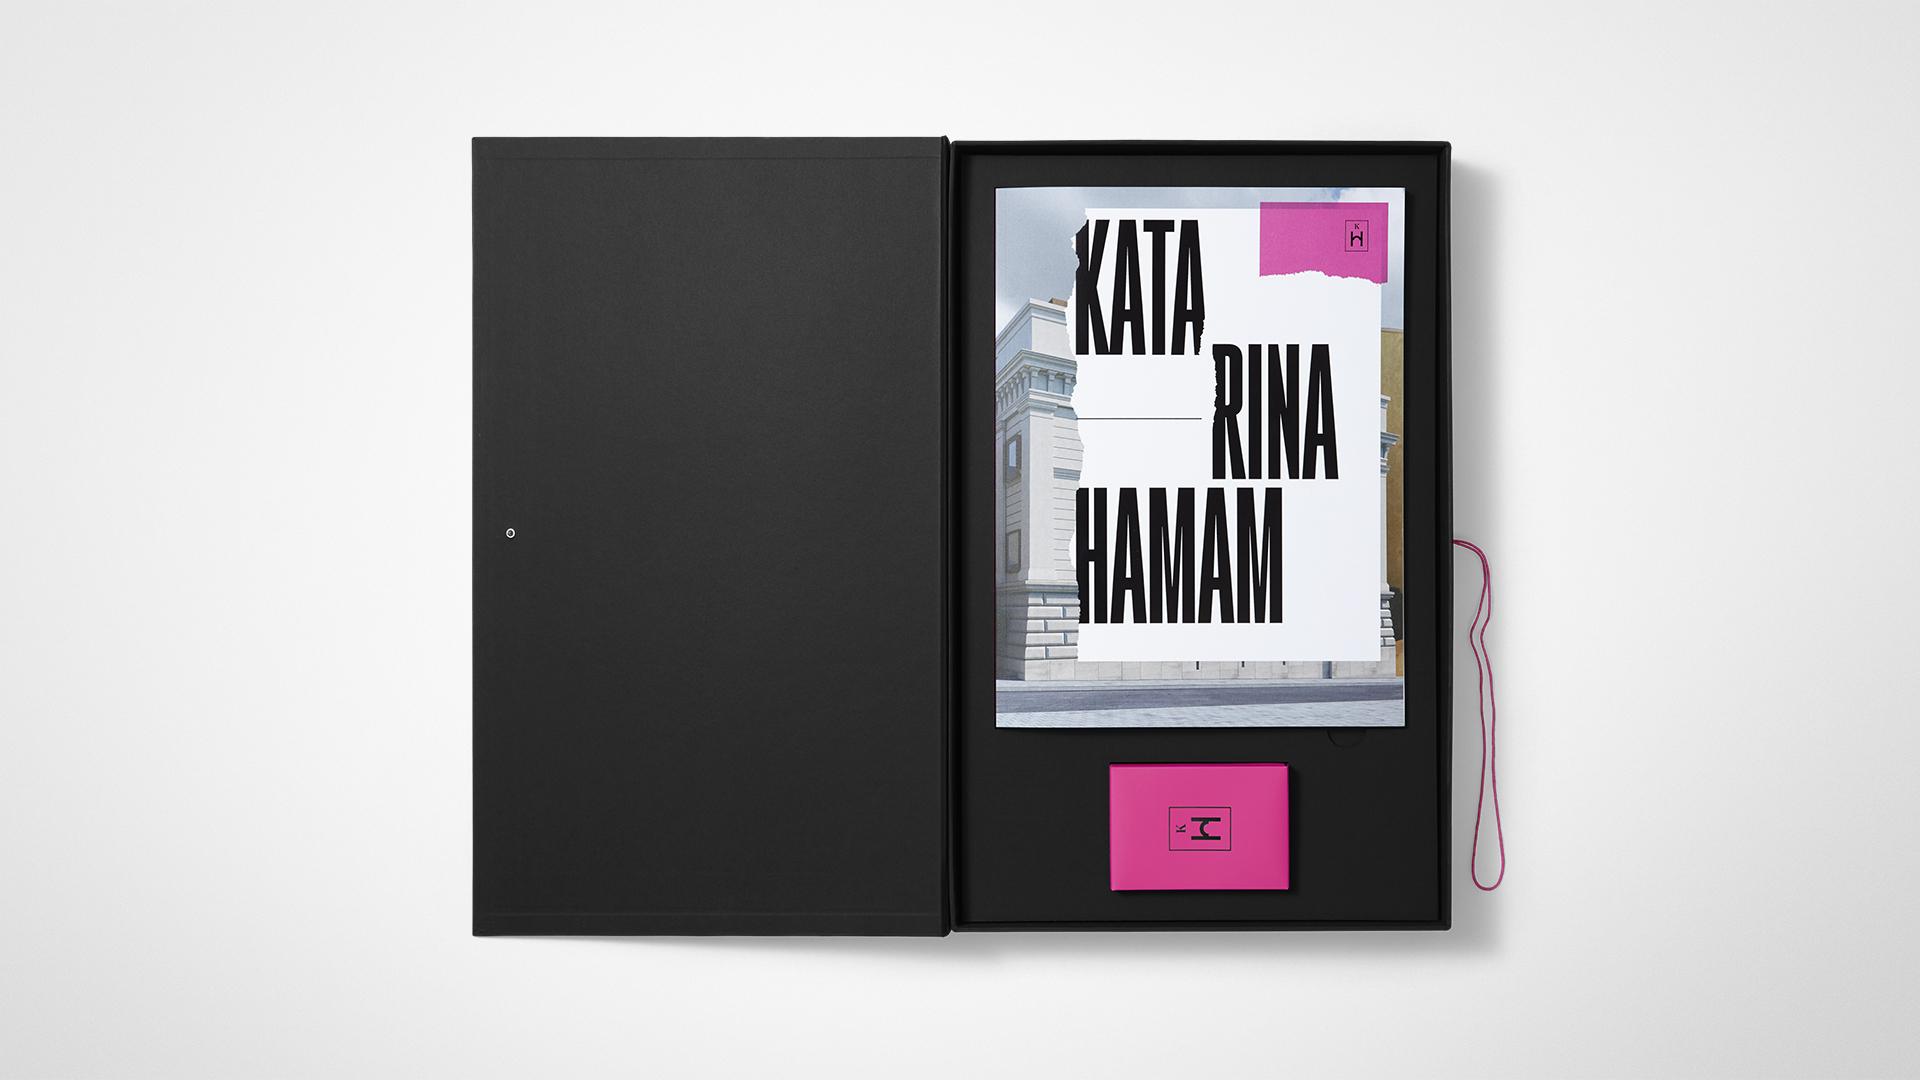 Katarina Hamam